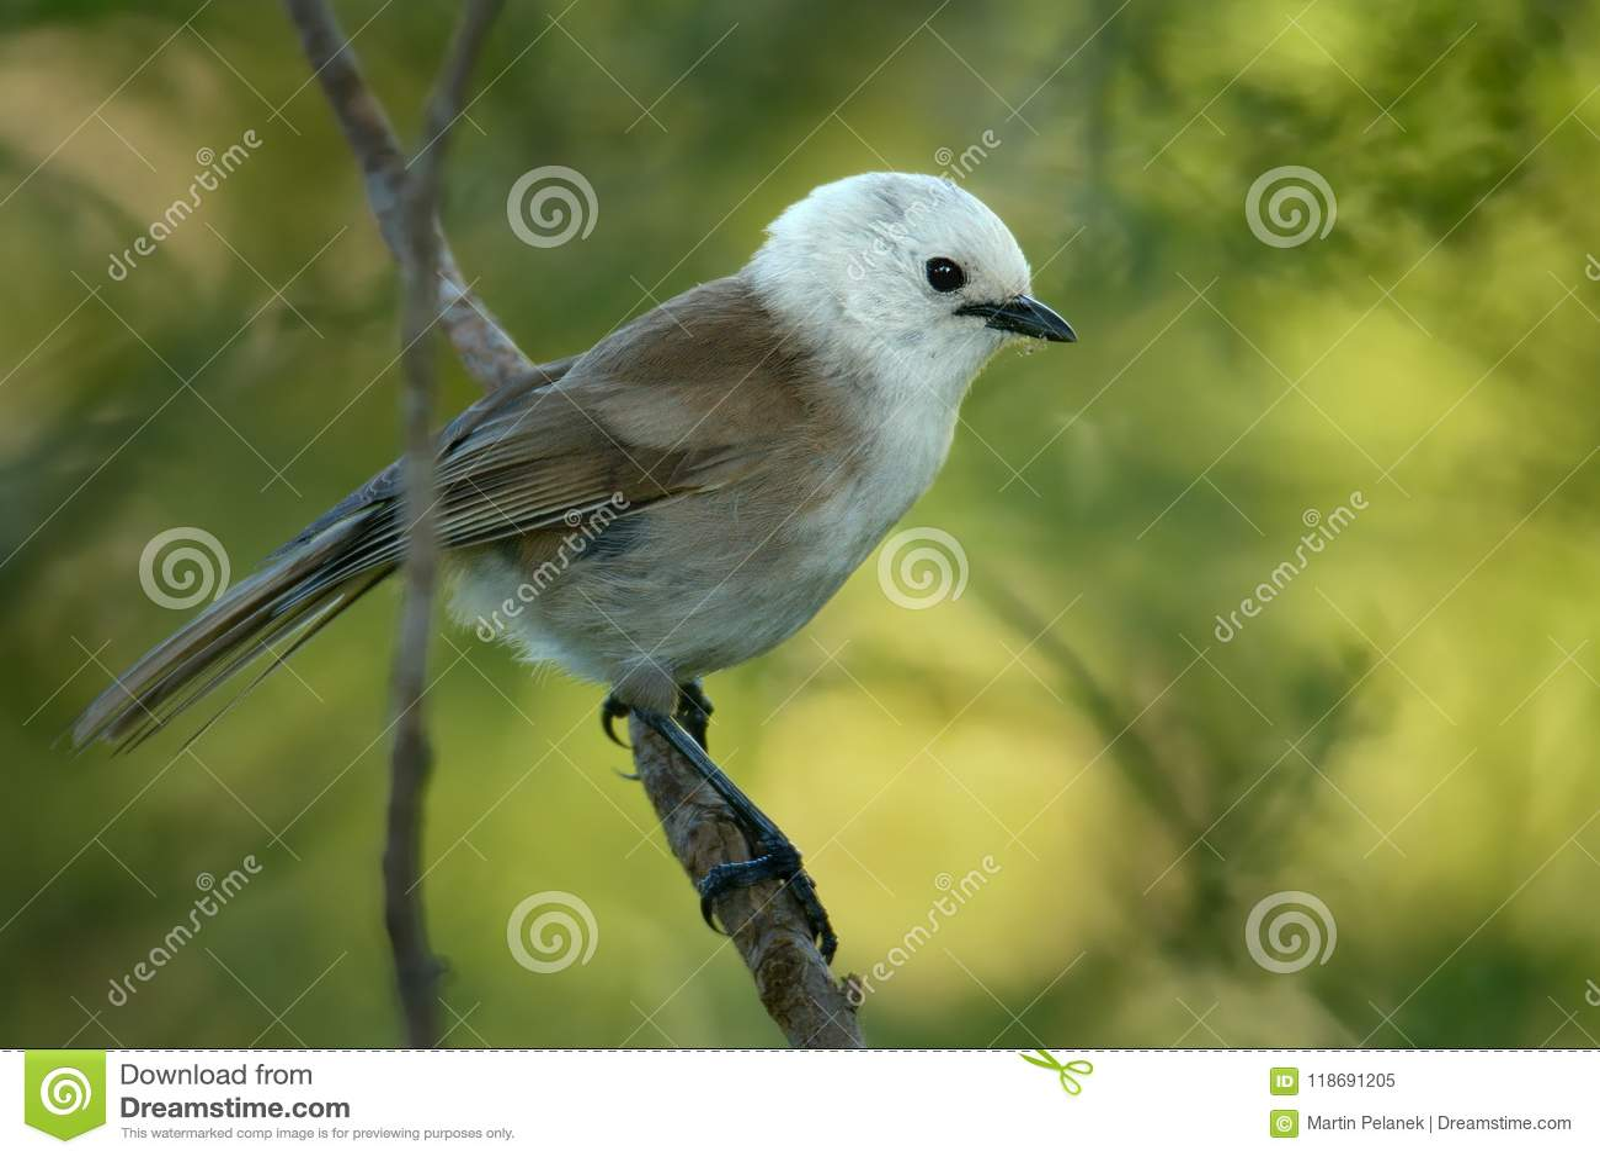 Whitehead - Mohoua albicilla - popokatea small bird from New Zealand, white head and grey body